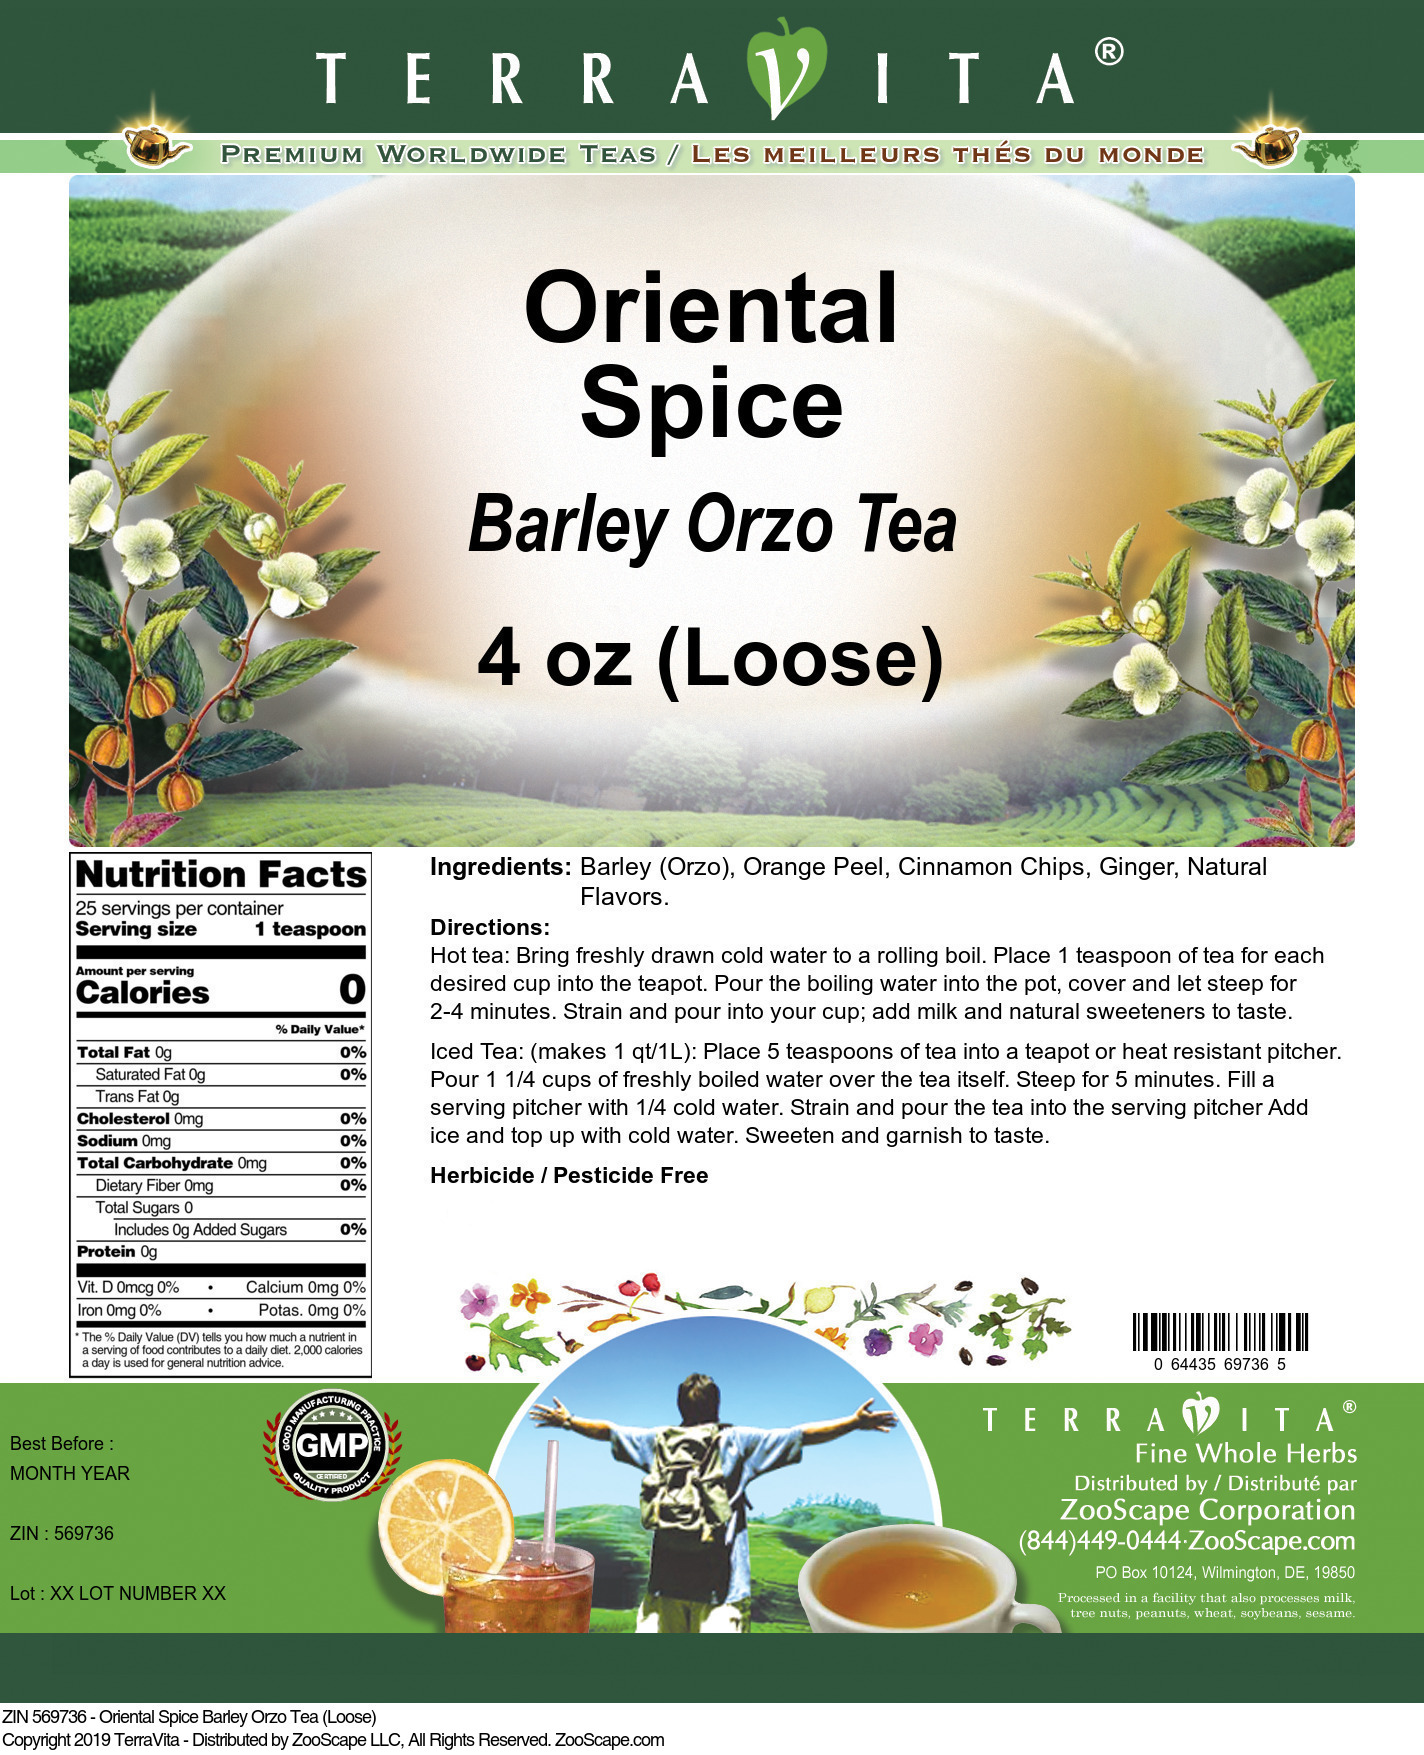 Oriental Spice Barley Orzo